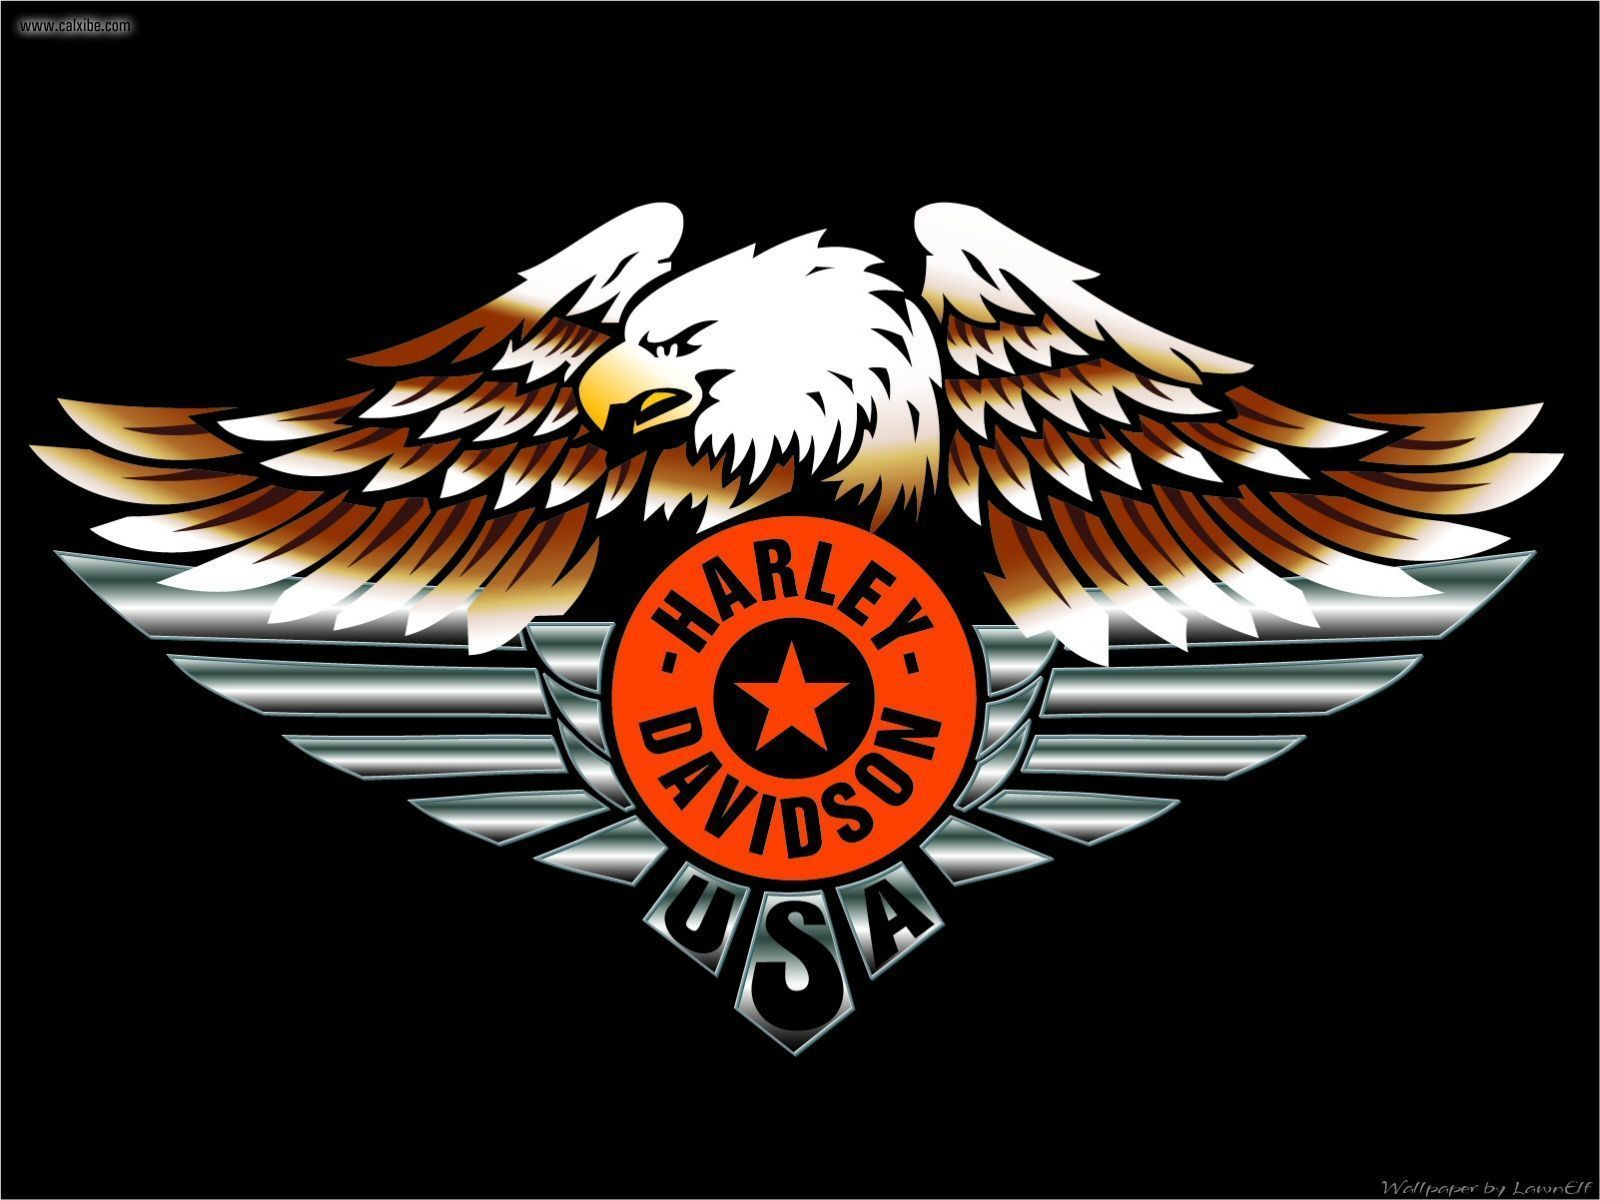 Harley Davidson Wallpapers Screensavers Hd Logo Wallpaper Pics